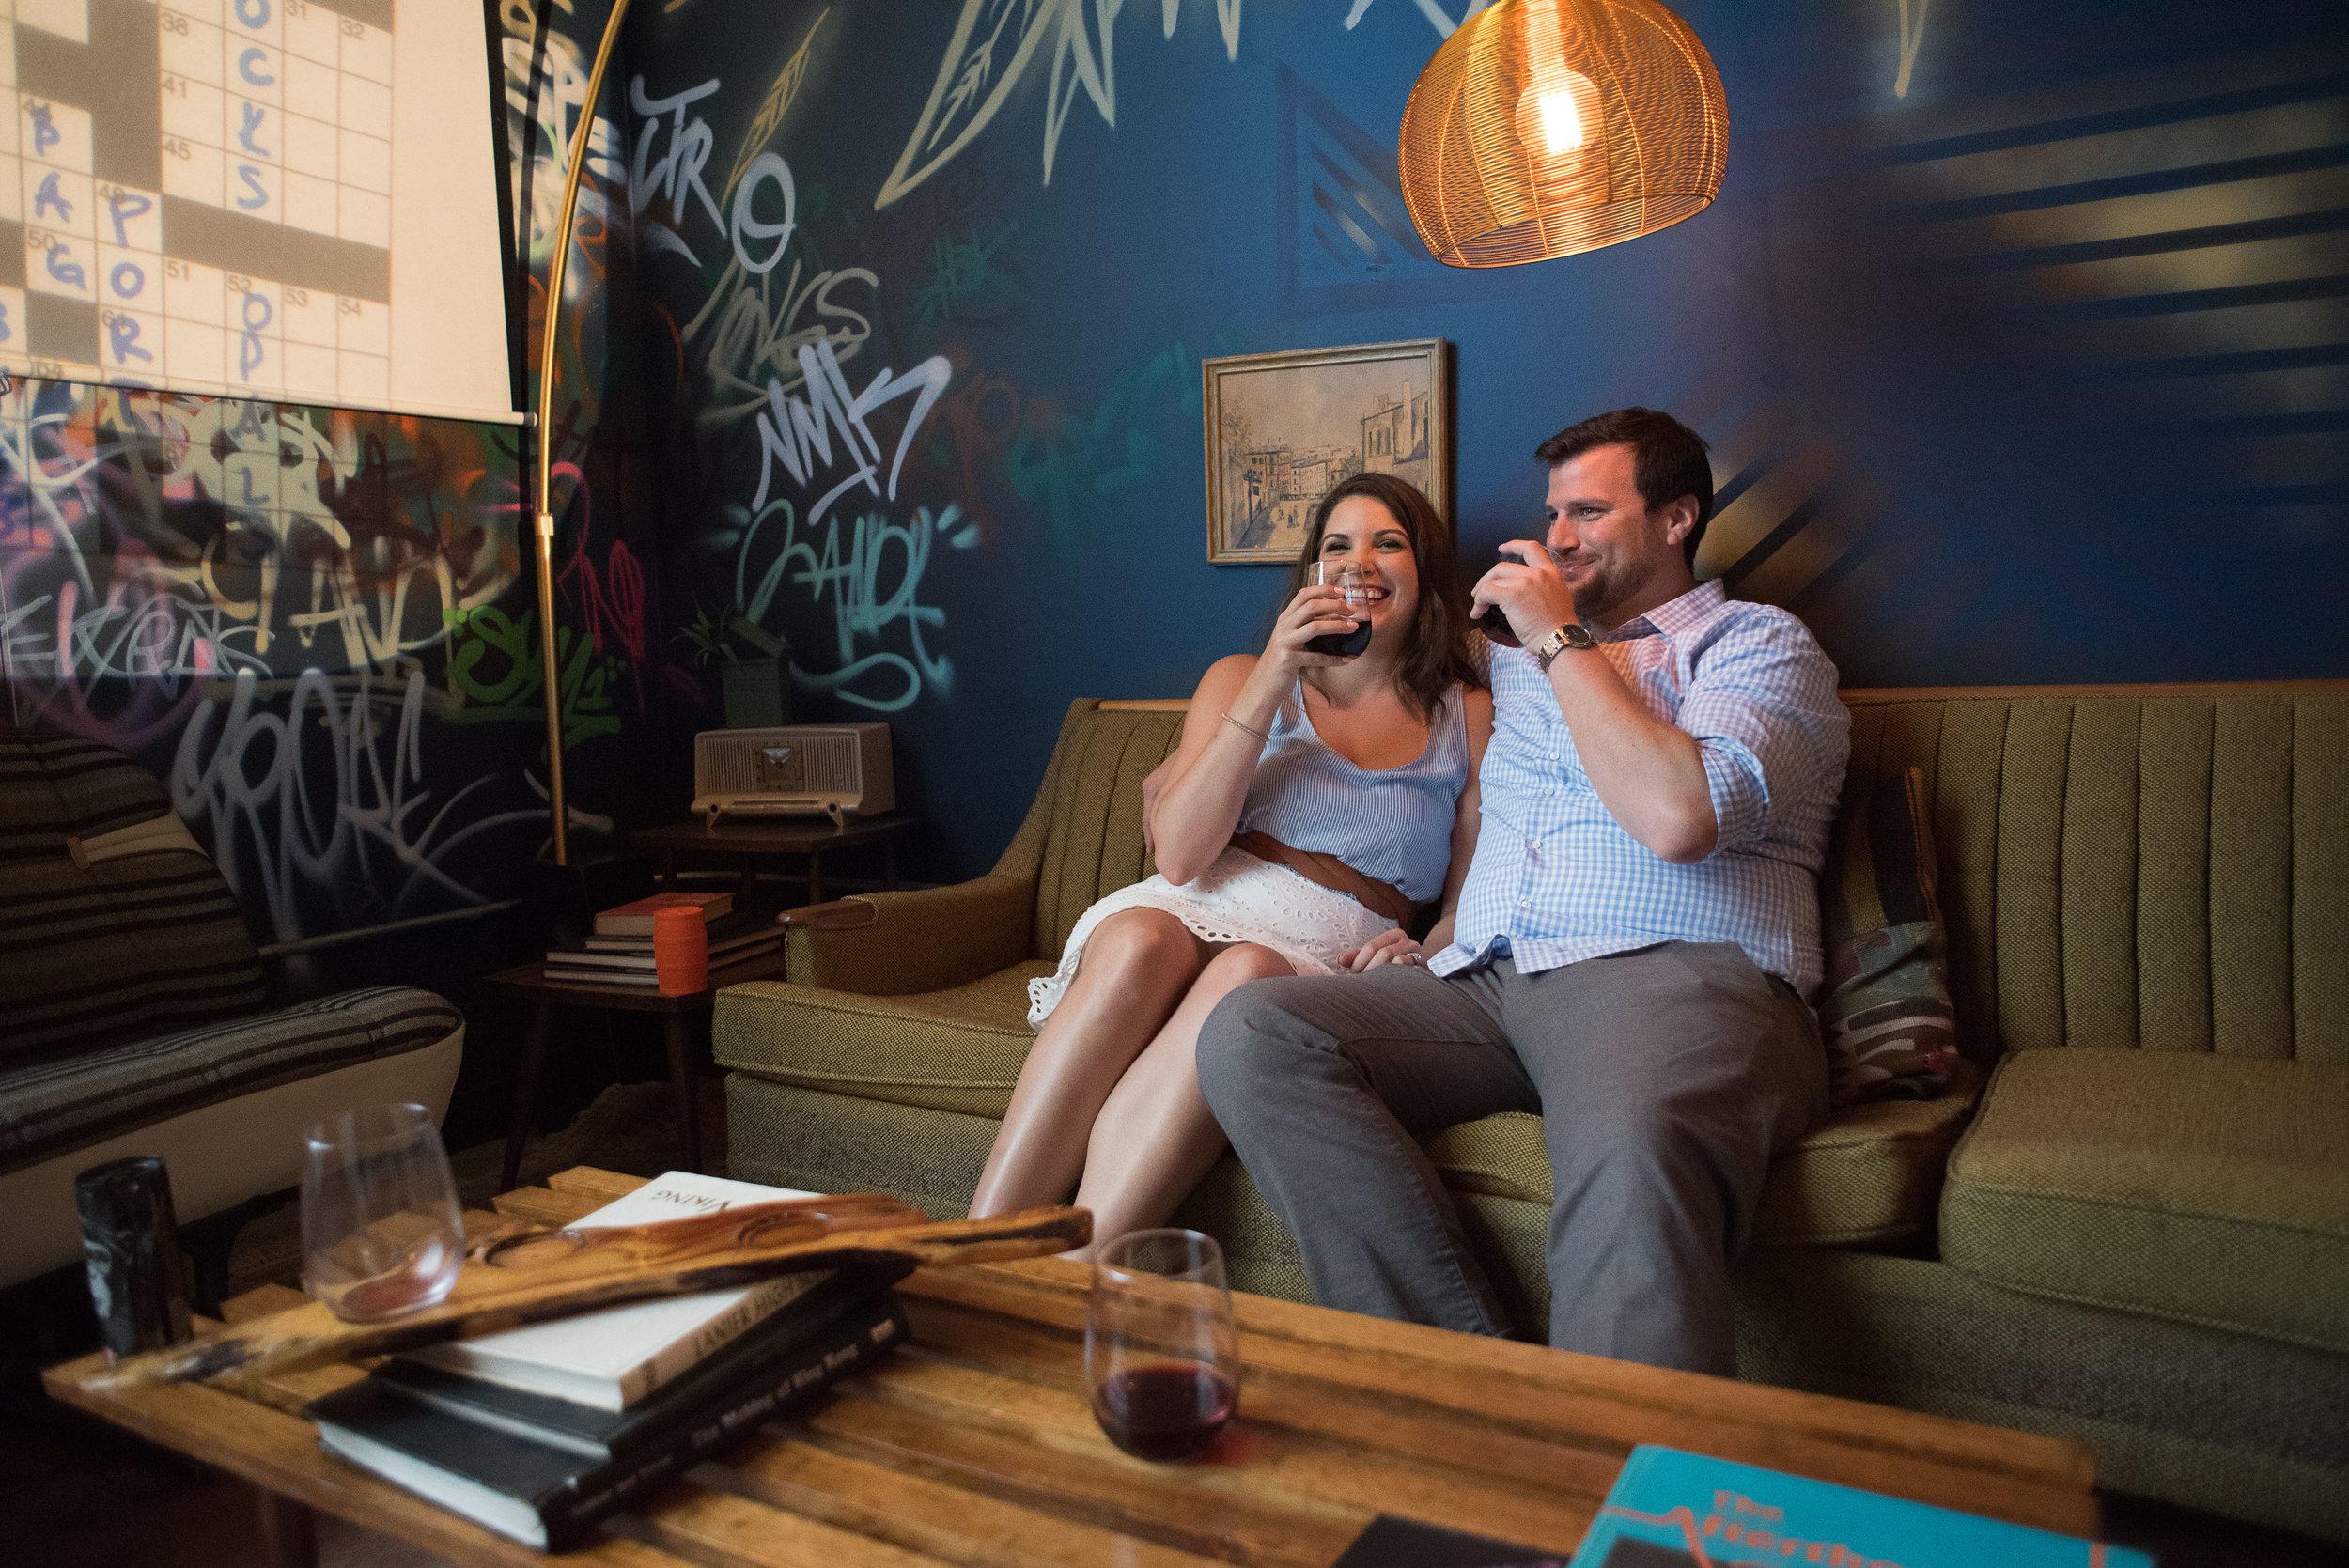 Austin Texas Engagement Photography  Mira Visu Photography Rebecca Hofstetter-1-4.JPG